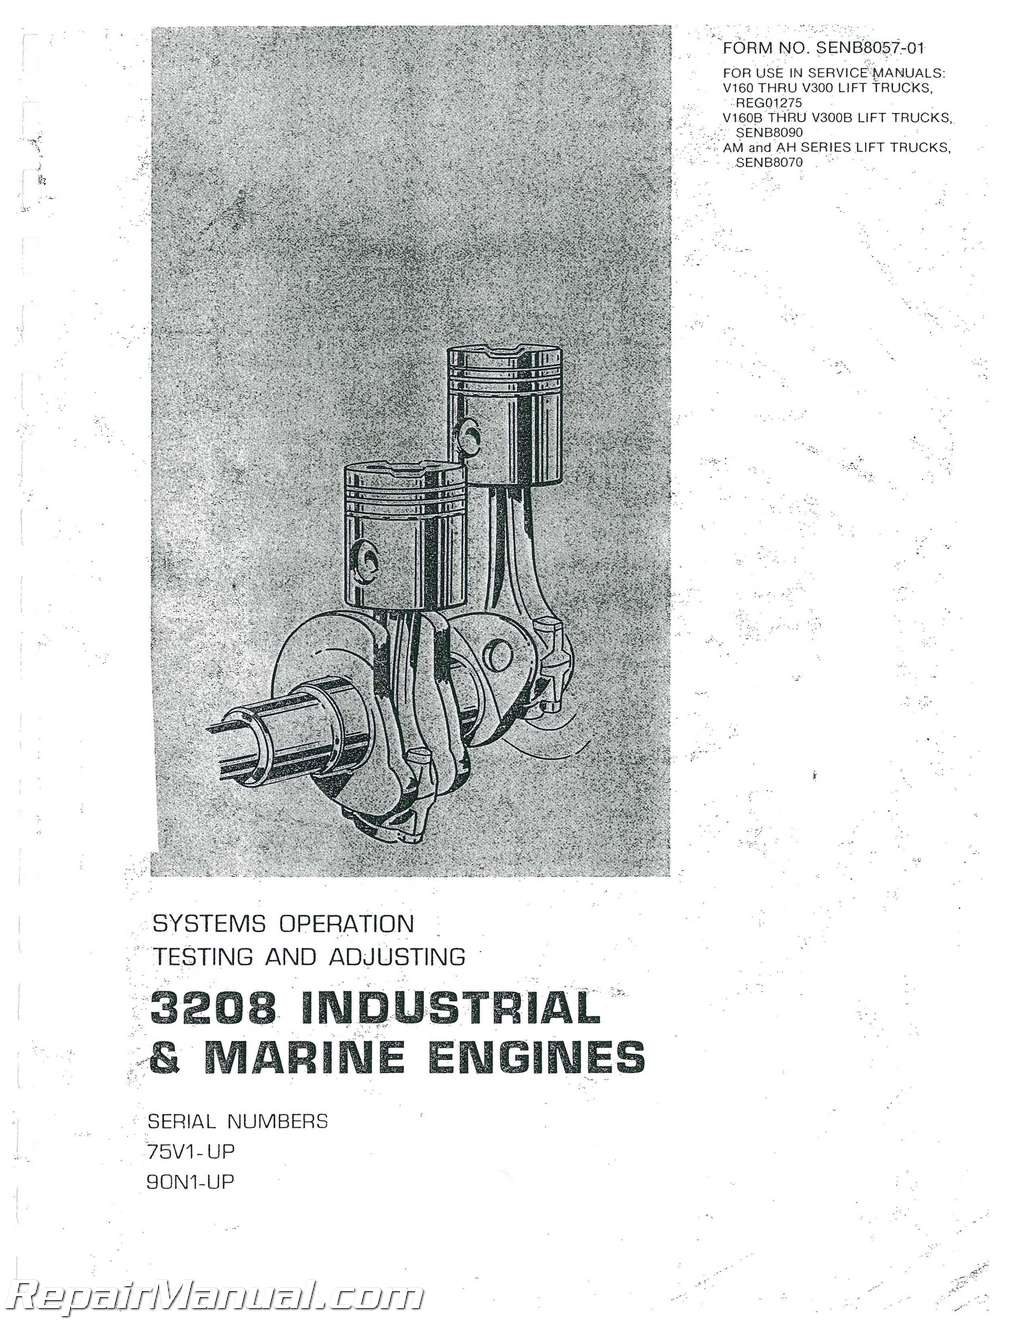 Caterpillar-Engine-3208-Ag-Marine-Early-Service-Manual_001- ...